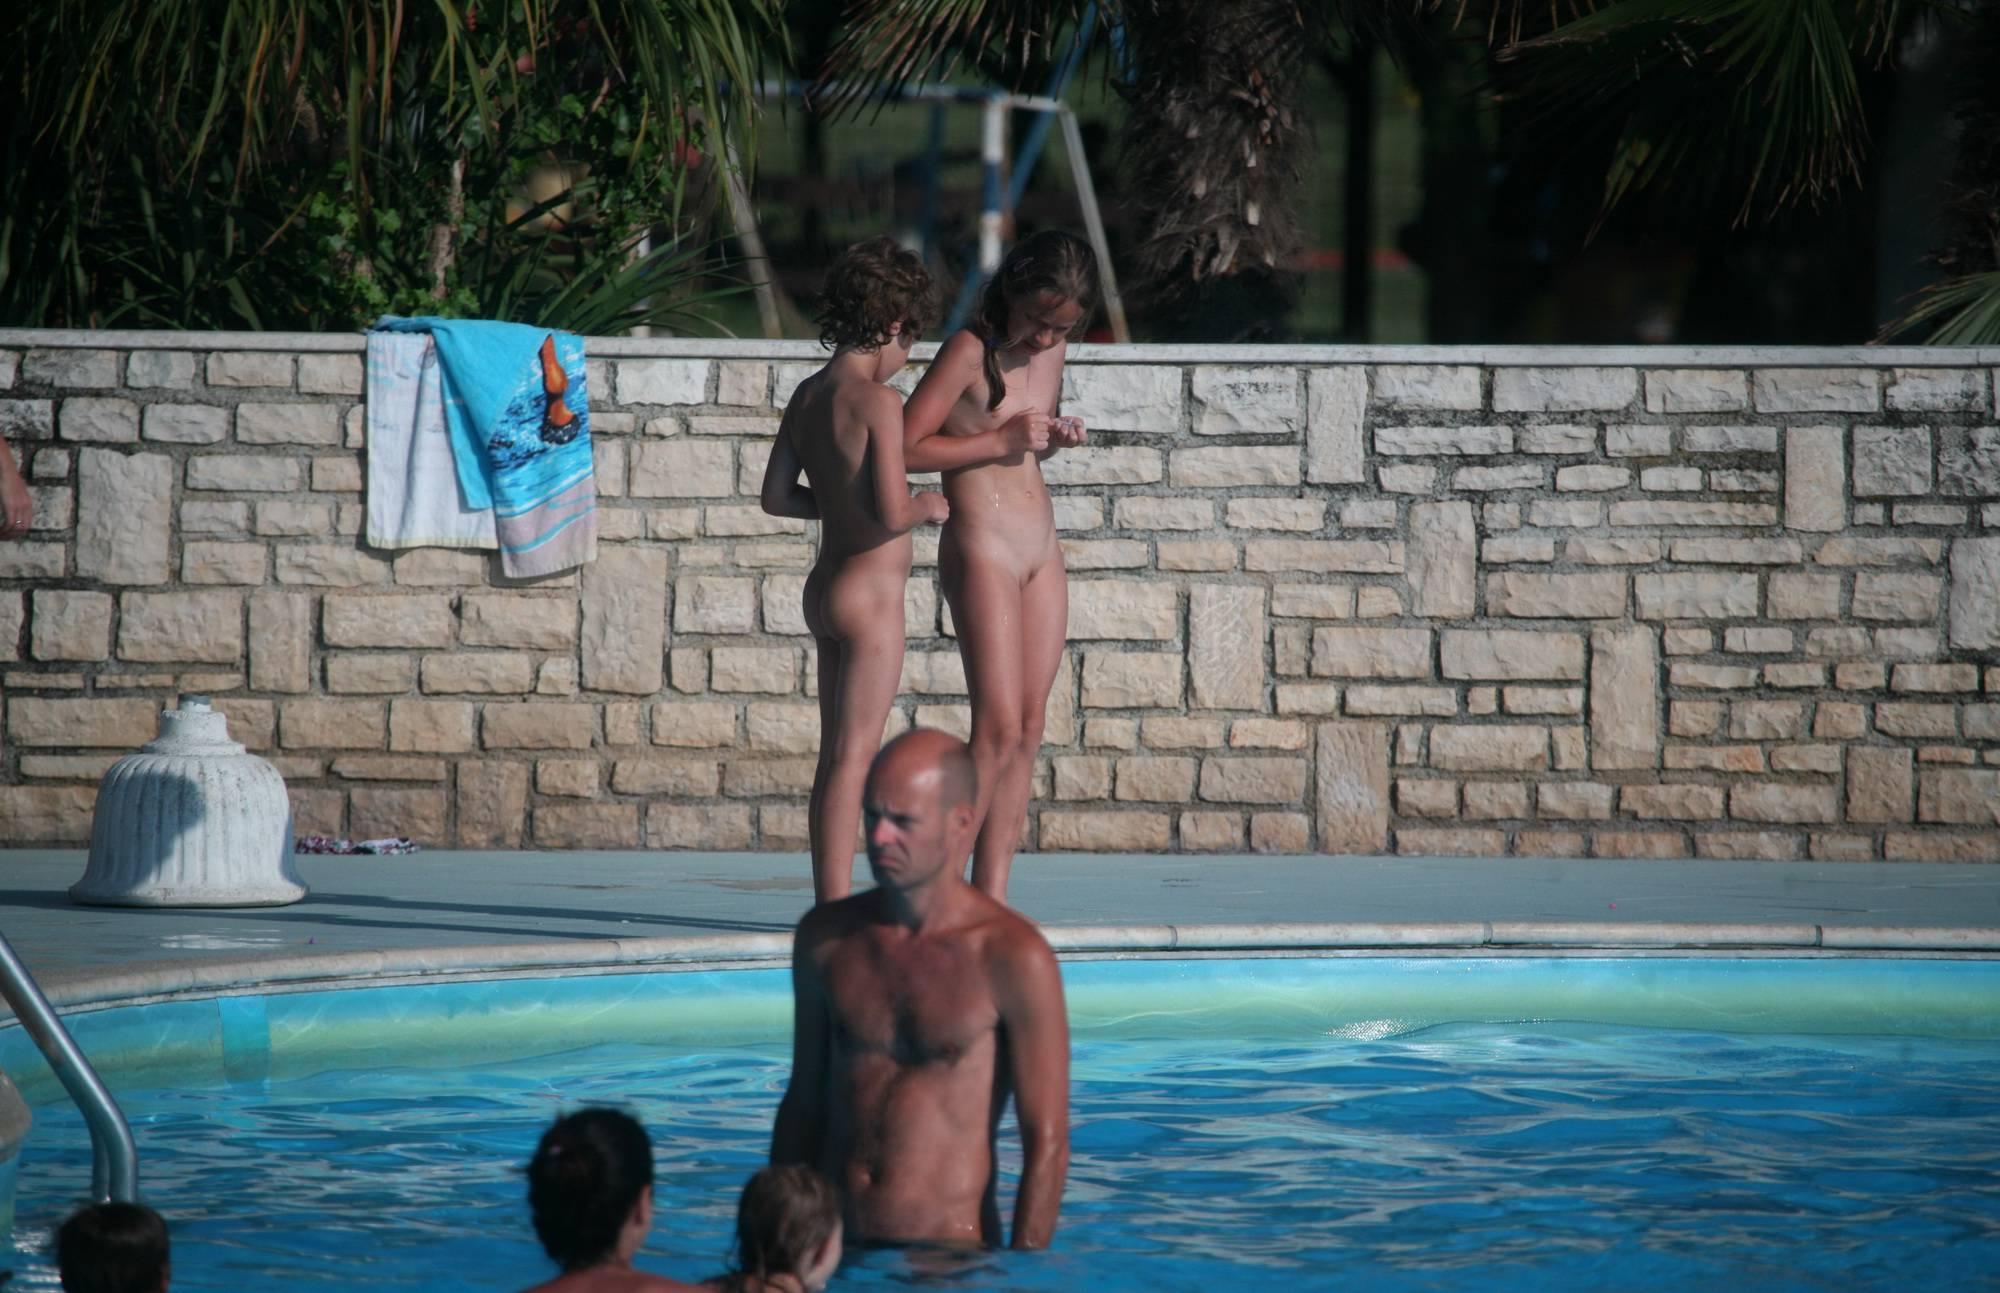 Two Poolside Nudist Girls - 2